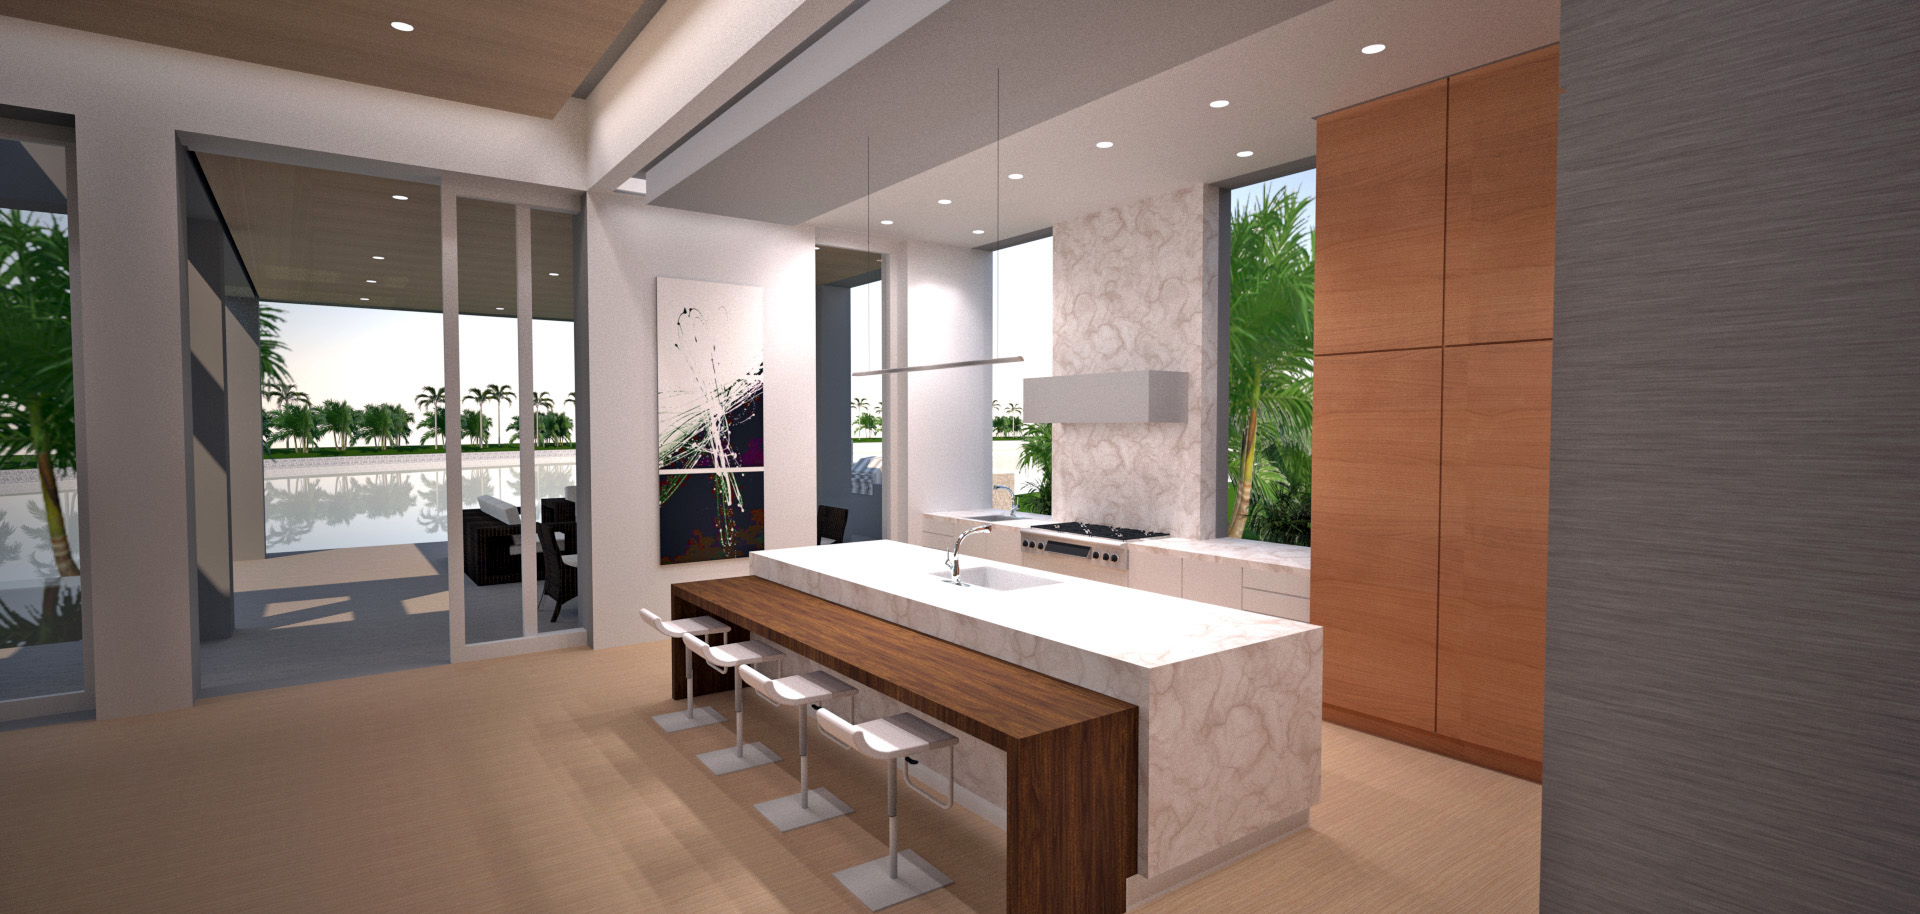 Kitchen 2-model.jpg